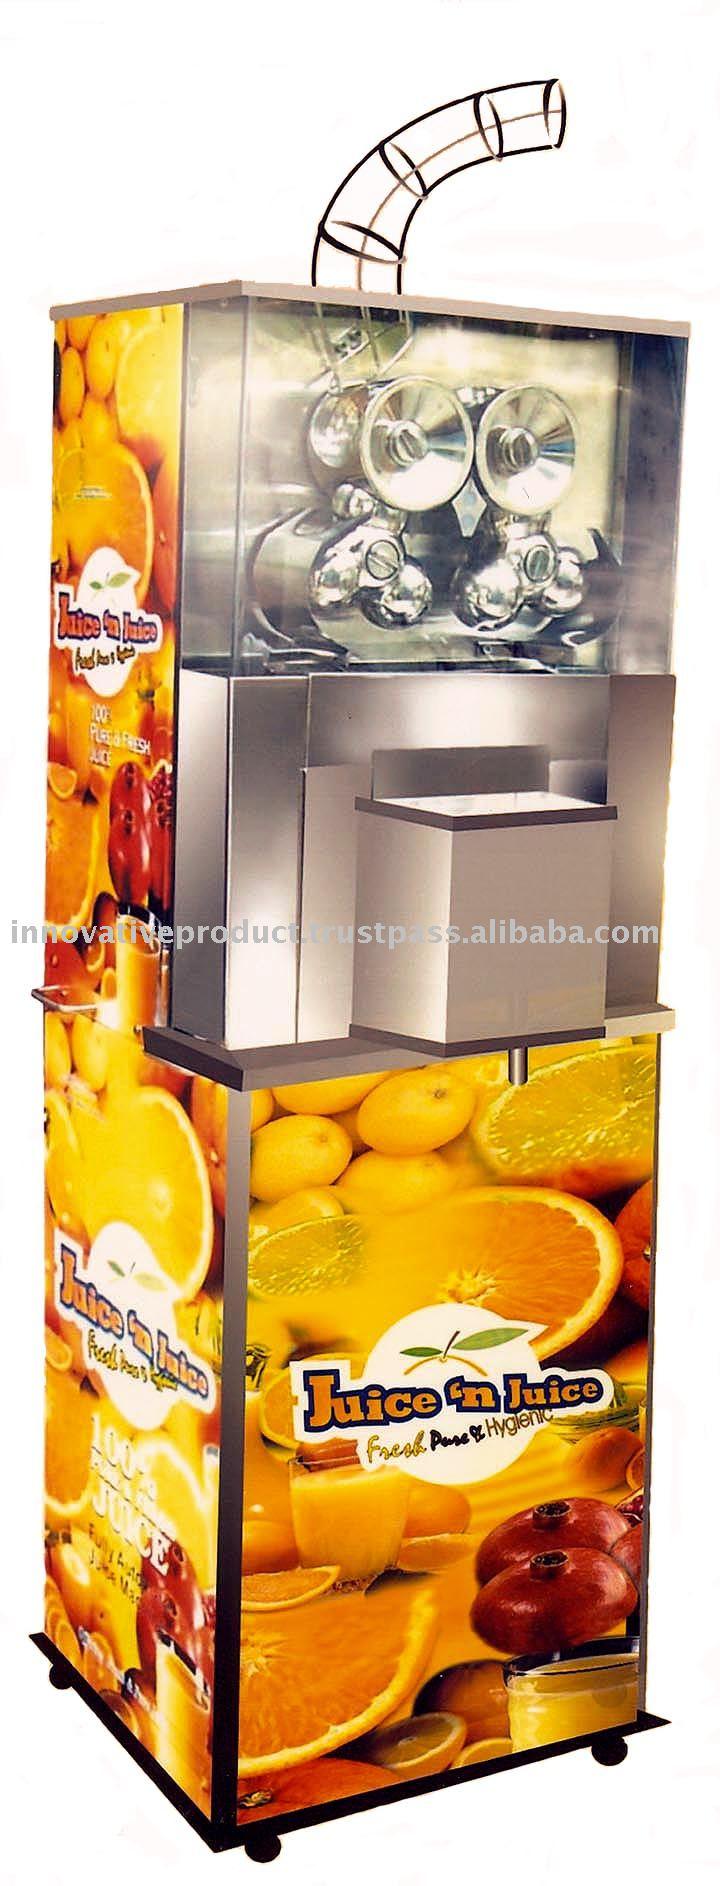 grenade orange machine jus extracteur de jus id de produit 106407229. Black Bedroom Furniture Sets. Home Design Ideas